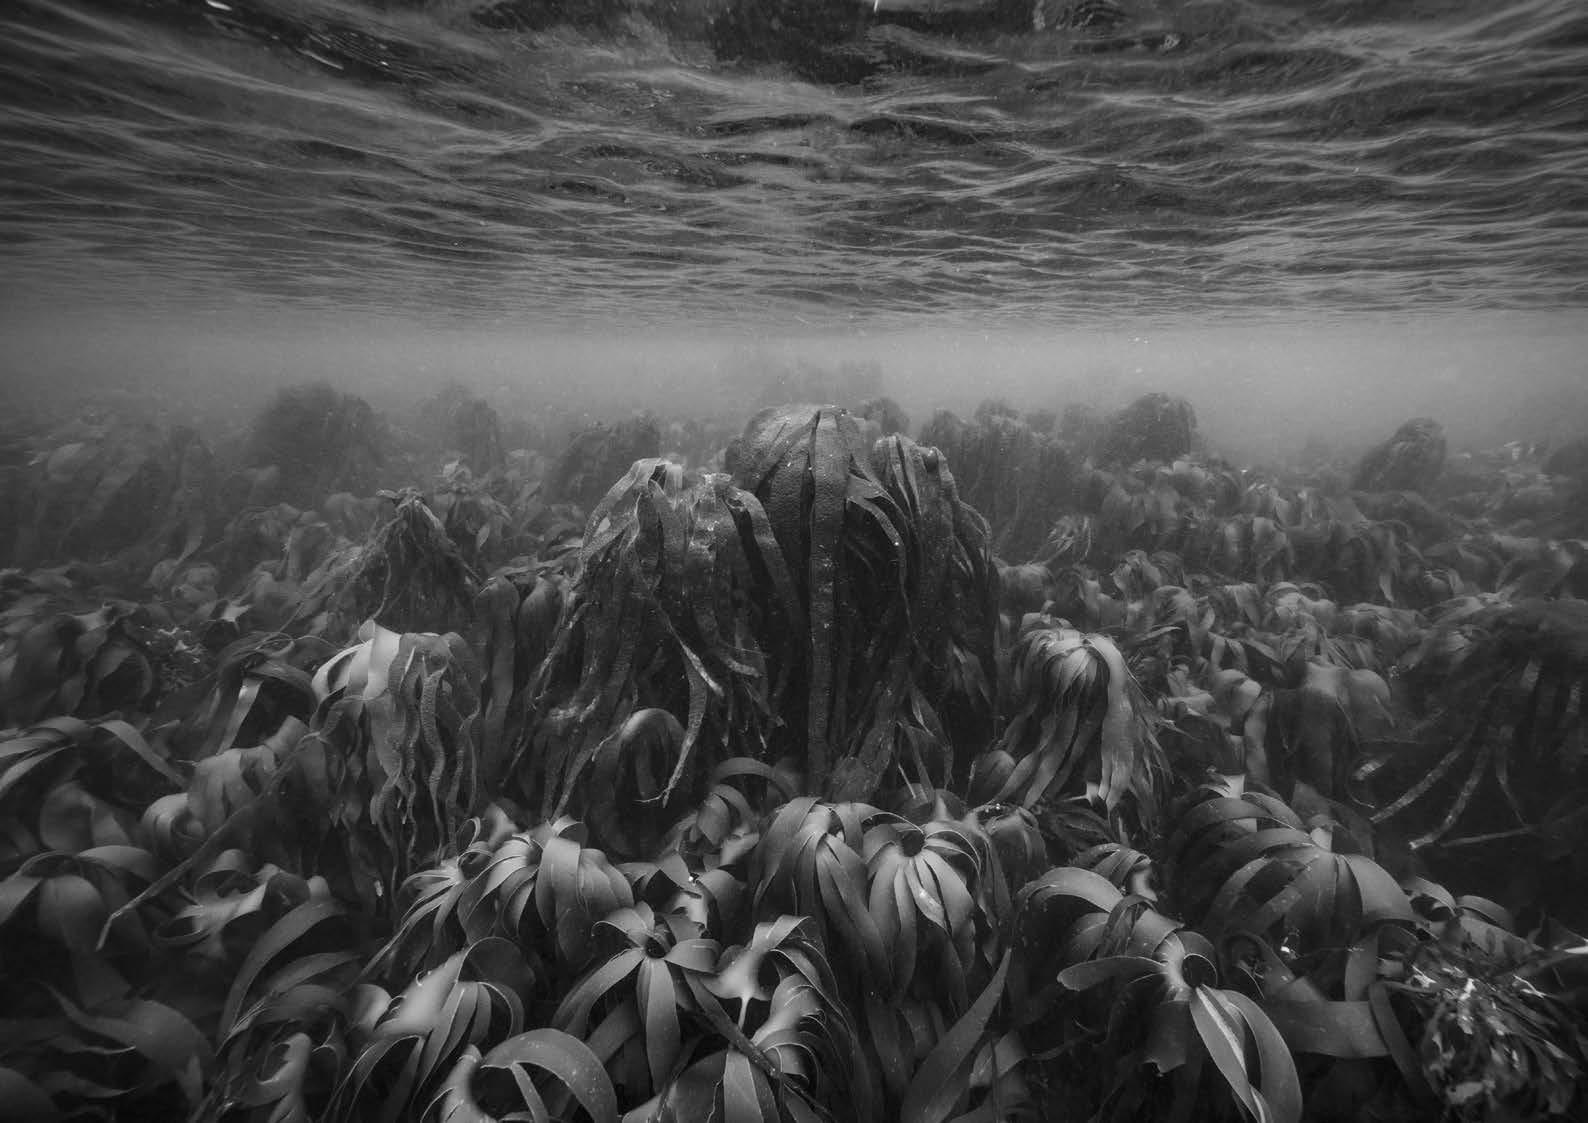 © Nicolas Floc'h_Paysages productifs, Initium Maris, 0uessant, - 7m, 2016